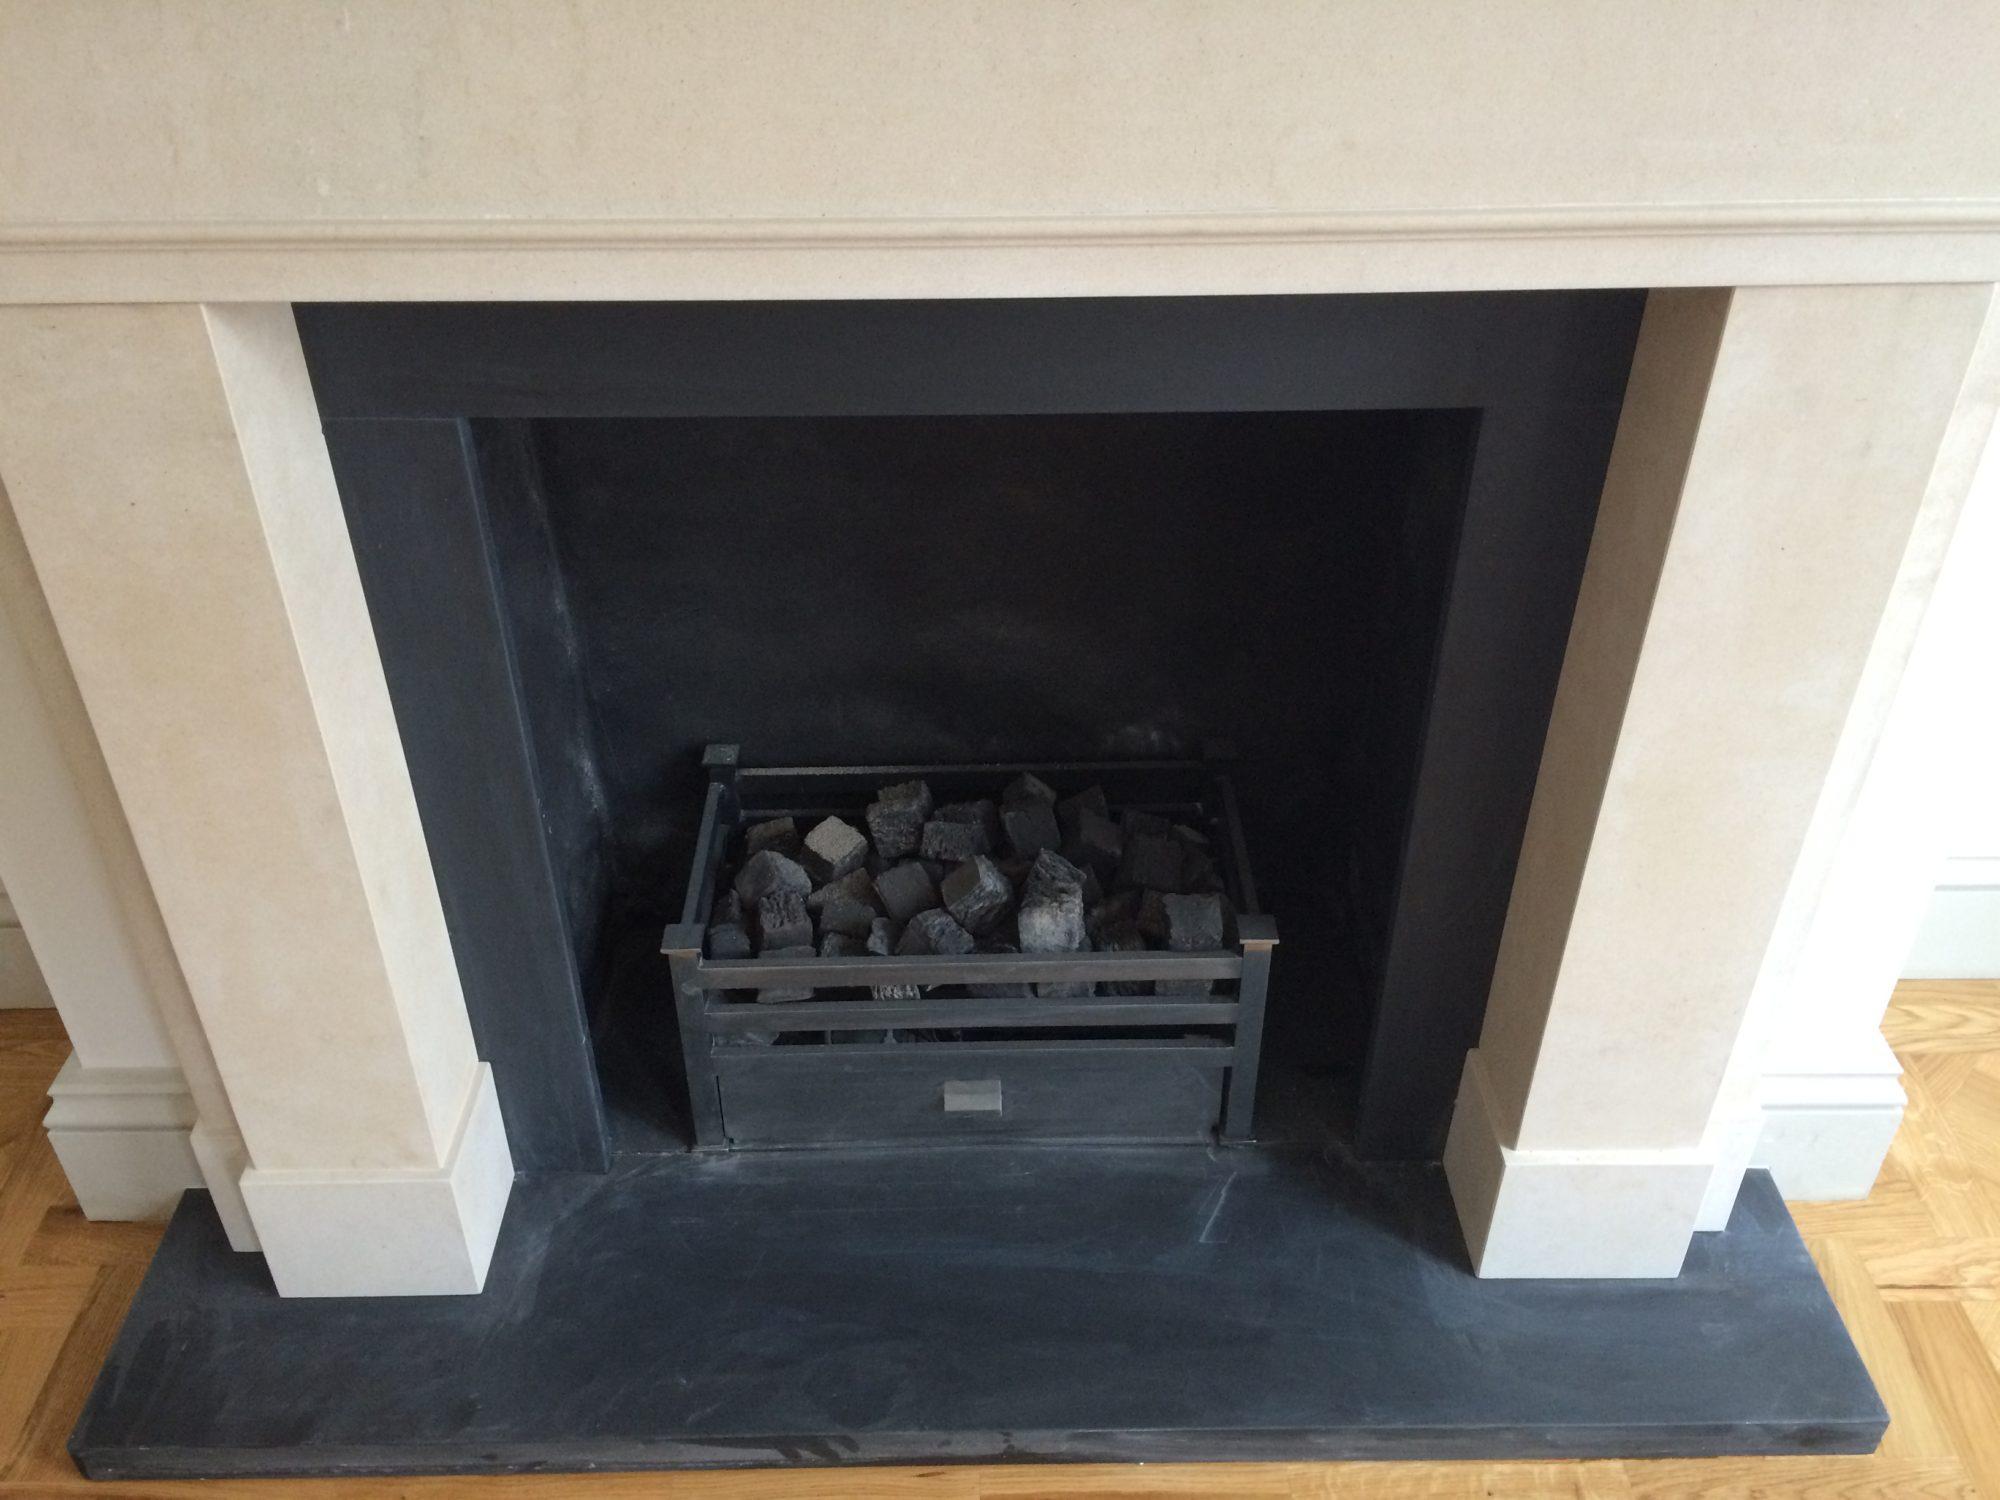 bespoke repairs ltd uk stone u0026 glass repair slate fire place